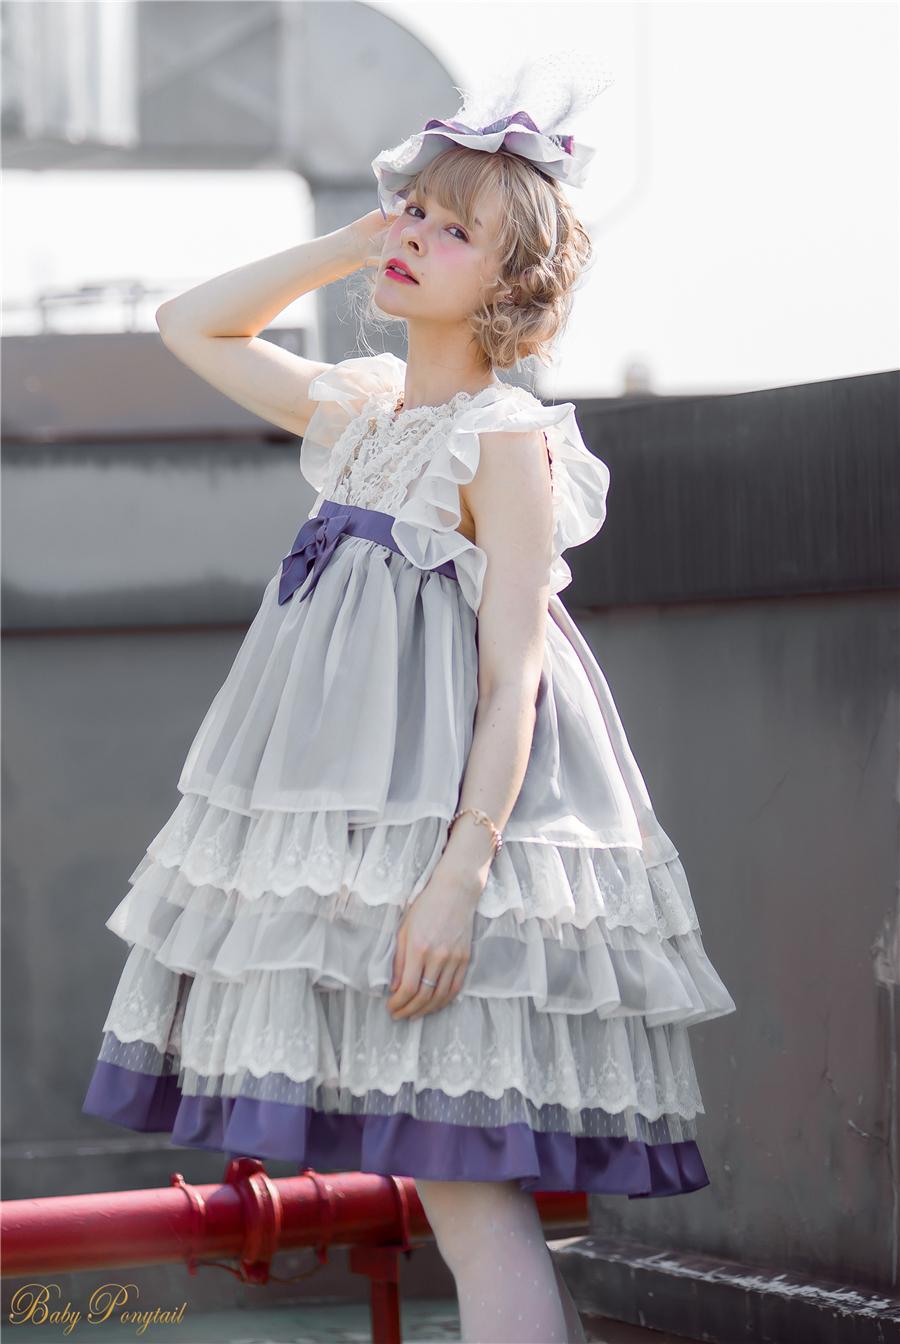 Babyponytail_Present Angel_JSK_Claudia4.jpg